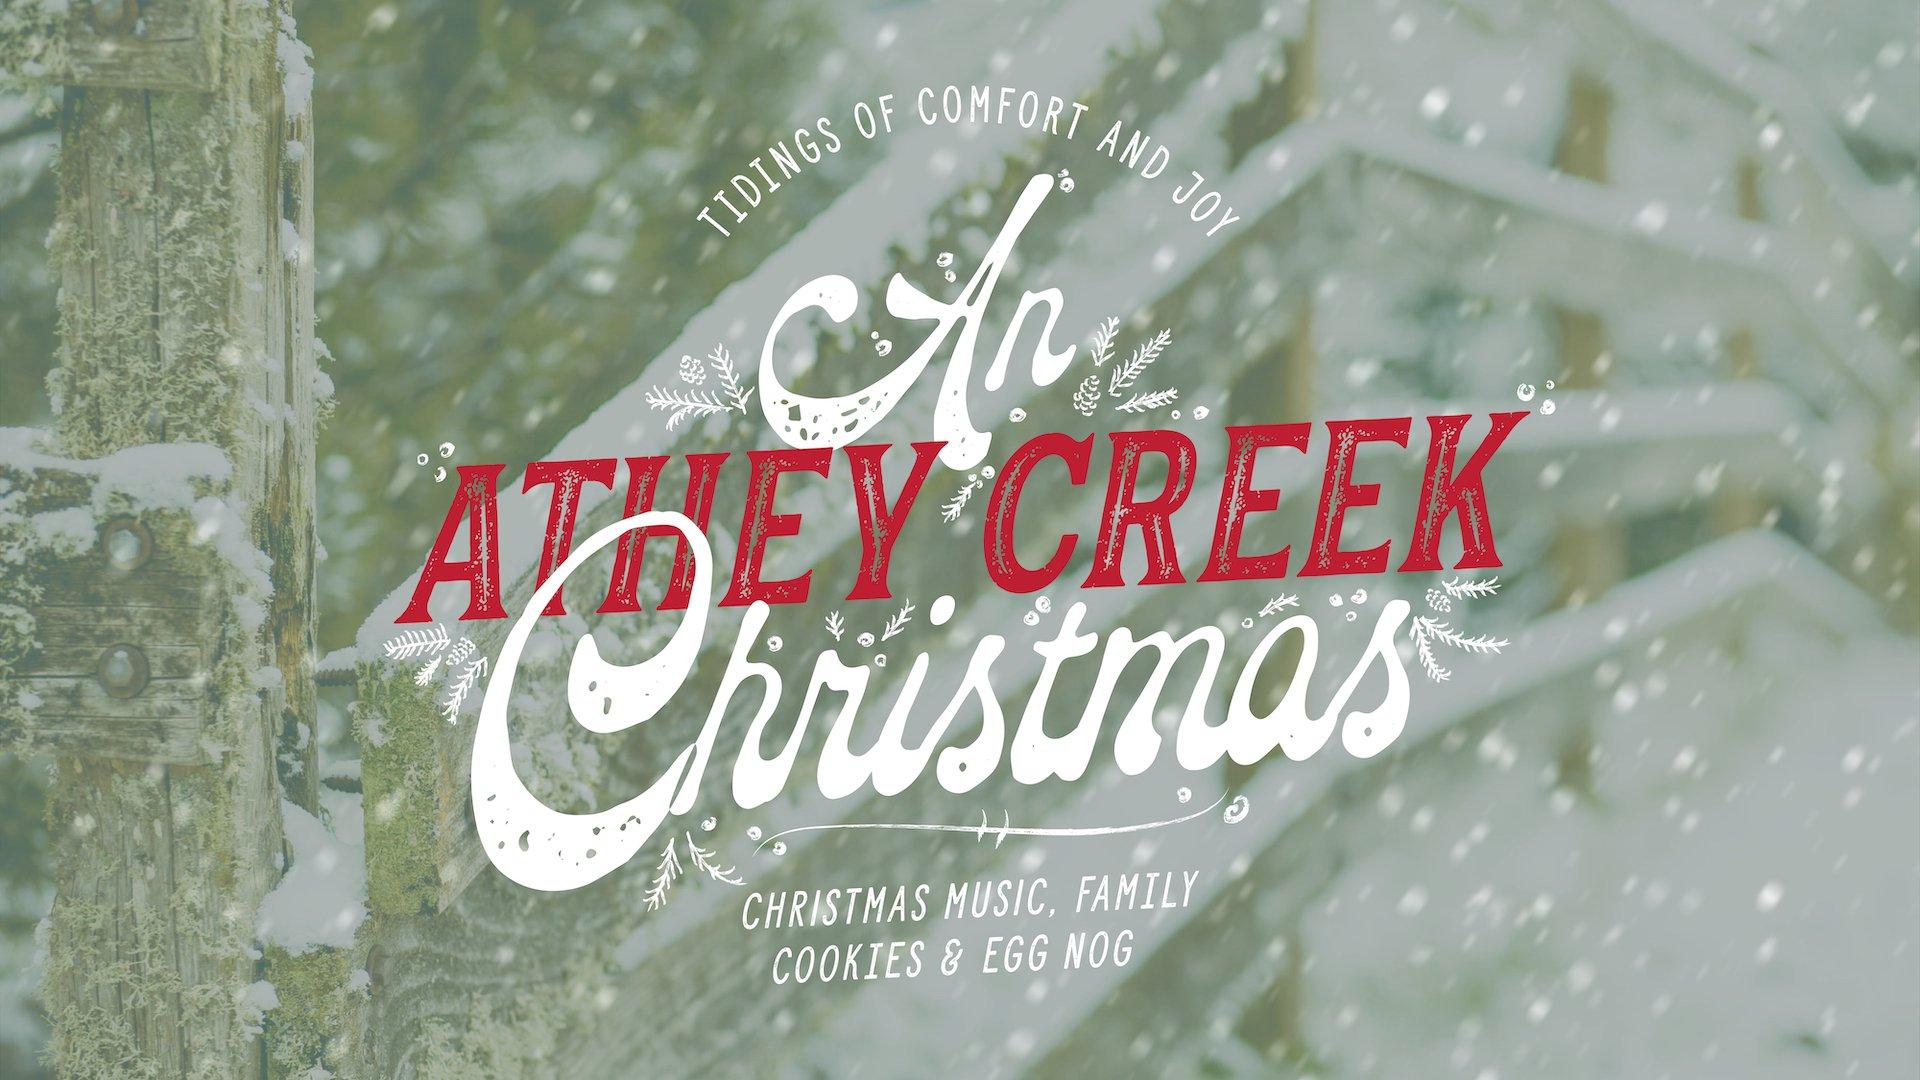 Poster for An Athey Creek Christmas